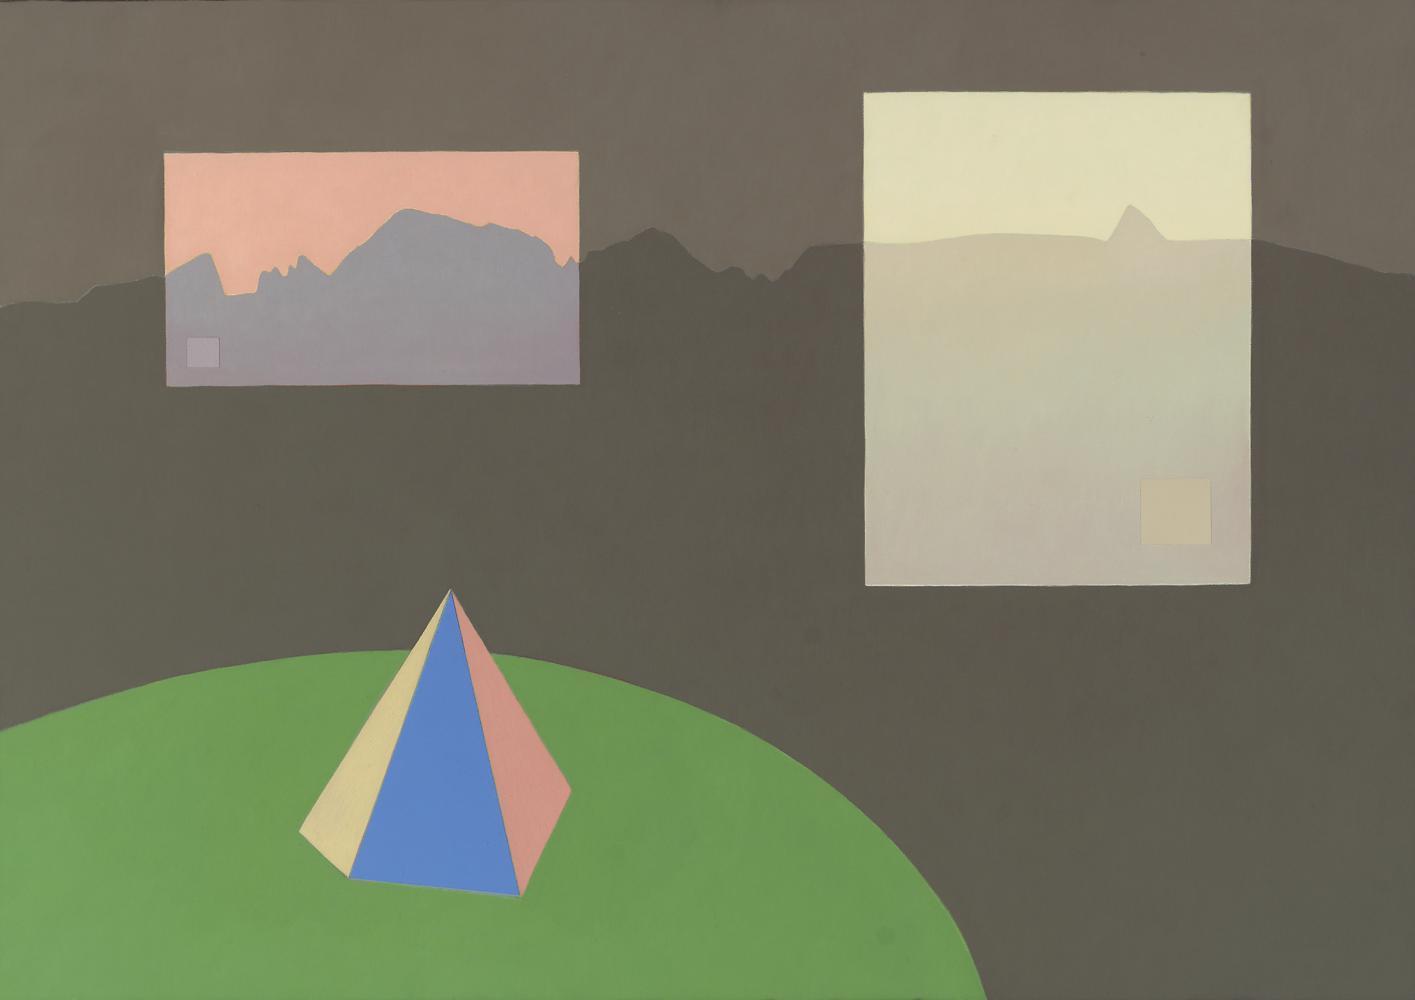 Pirineos (1 cuadro, 3 cuadros), 65 x 92 cm, óleo lienzo, 2003.